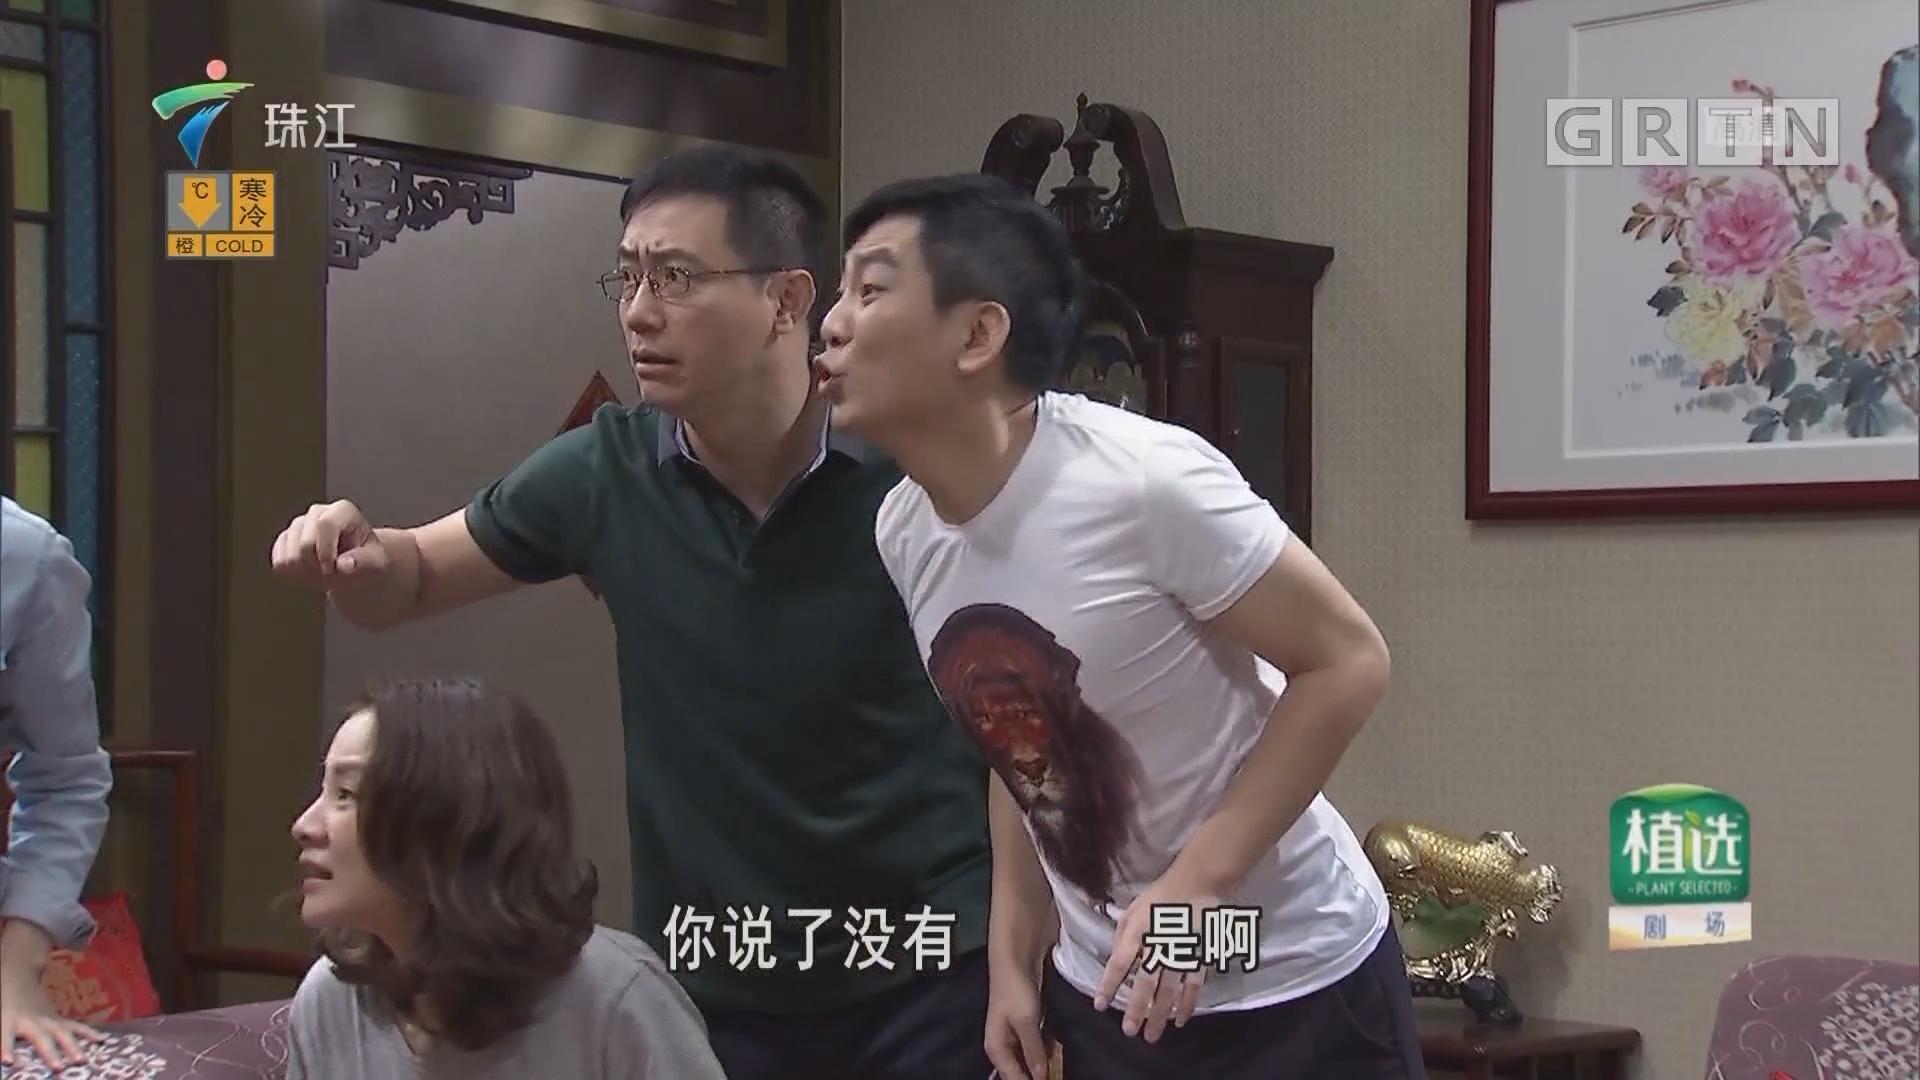 [HD][2018-12-30]外来媳妇本地郎:已婚人士(下)